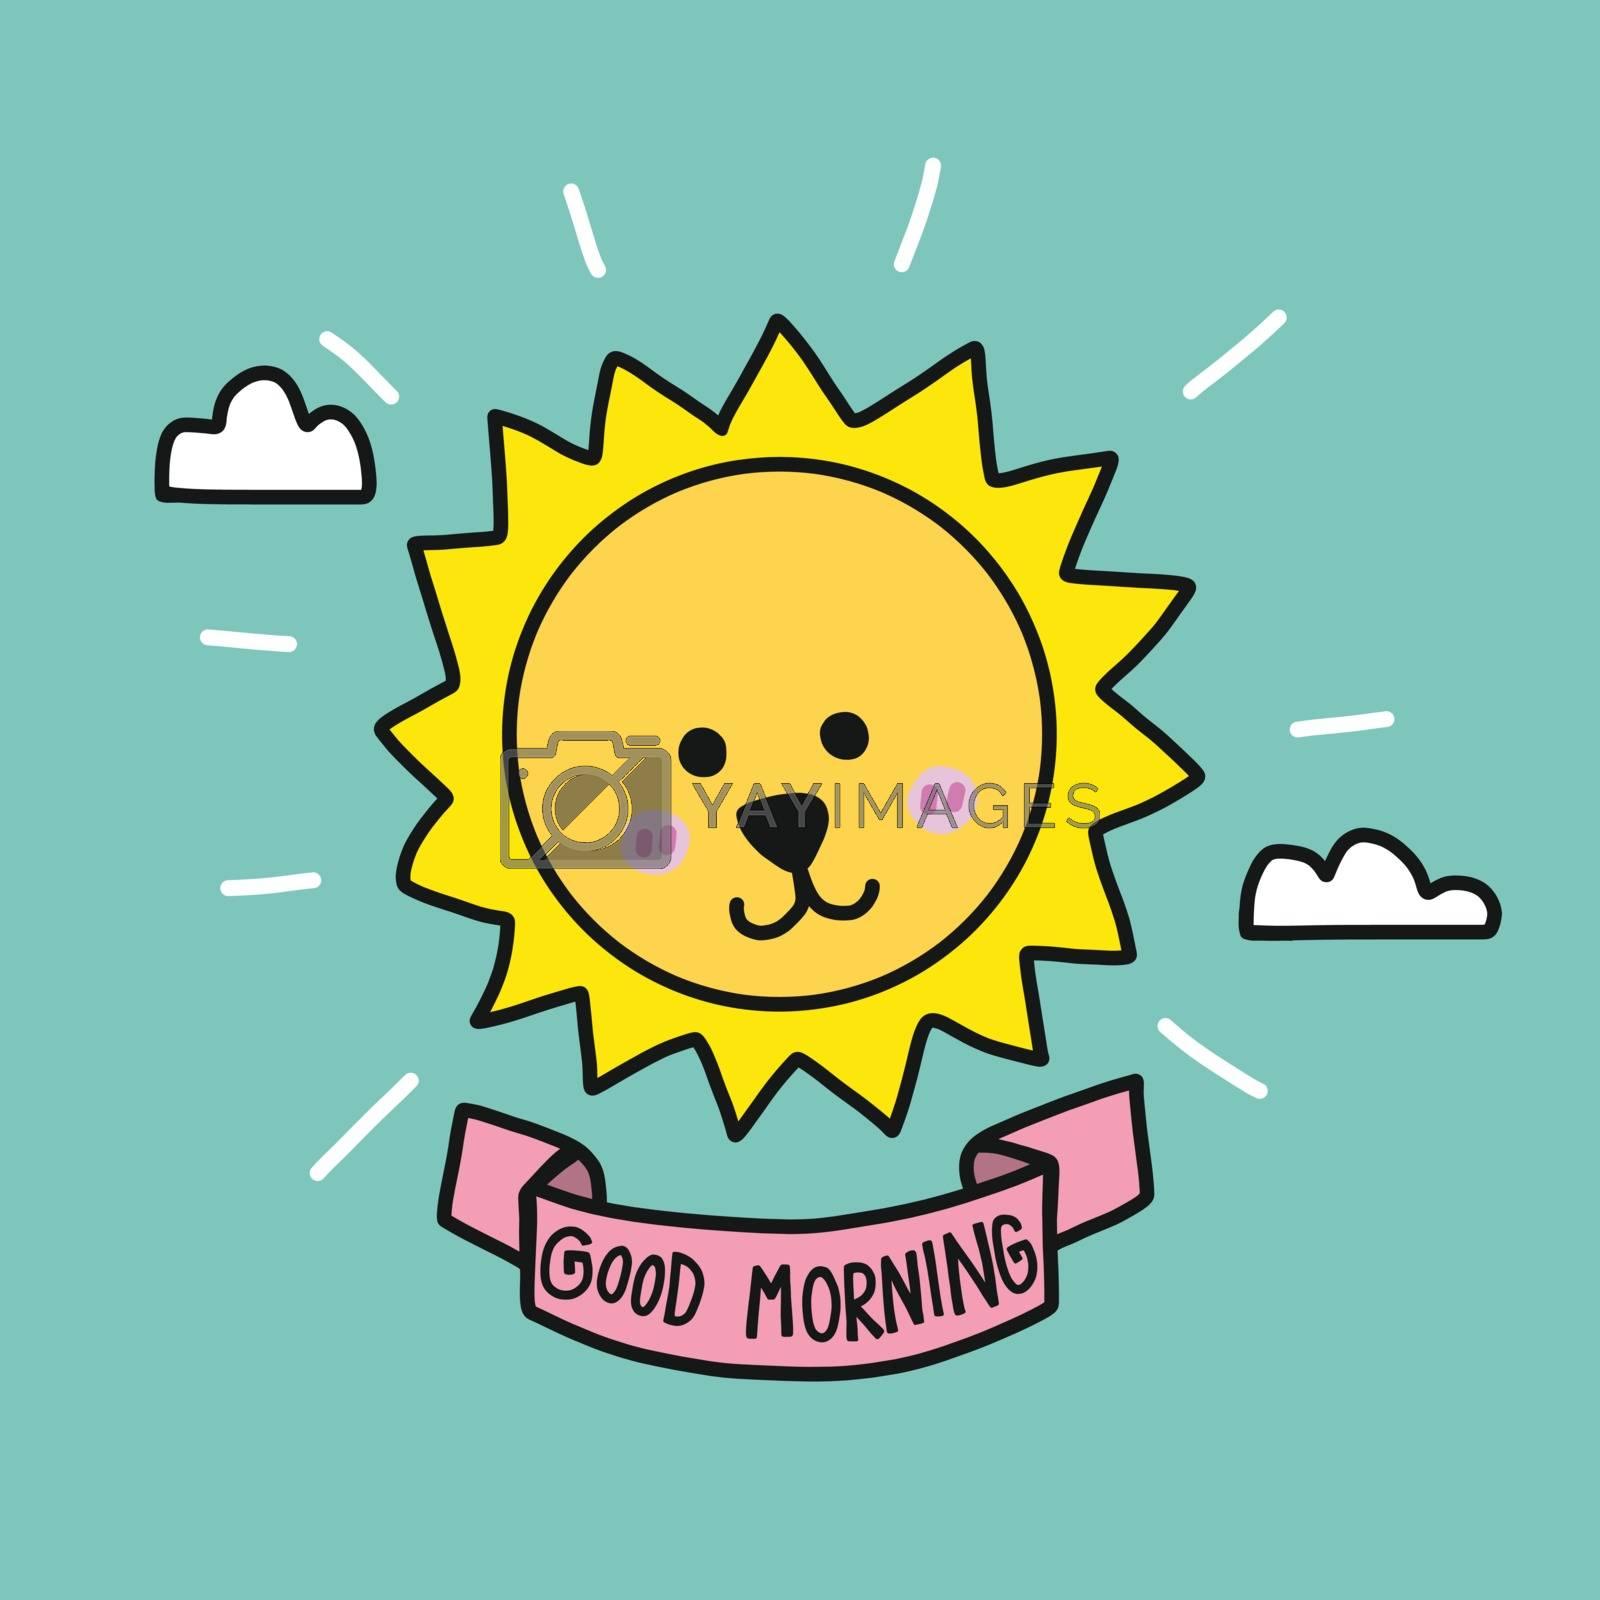 Good morning cute sun raise cartoon vector illustration doodle style